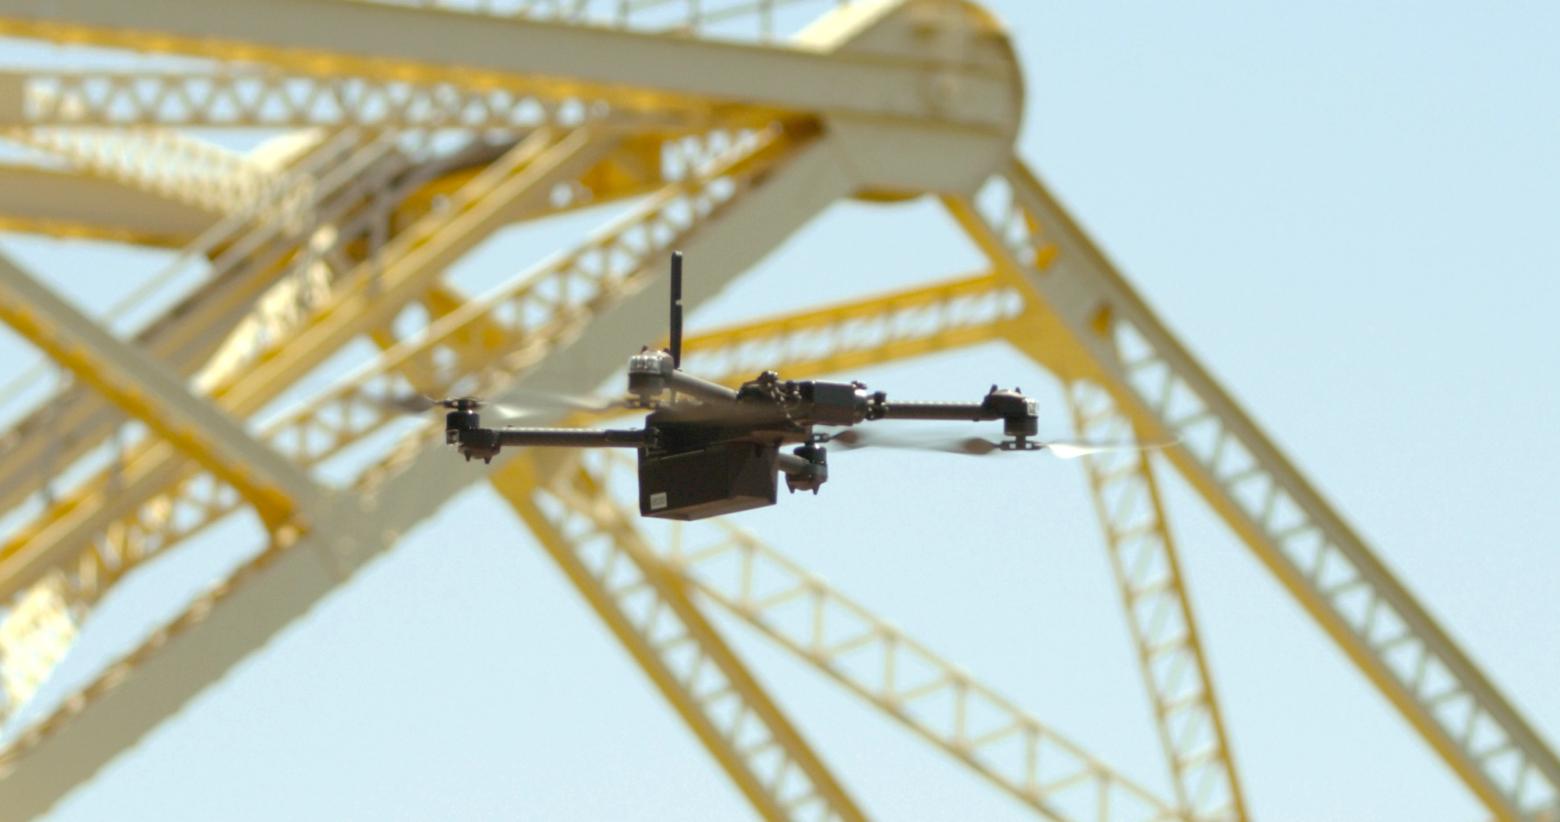 Skydio X2 flying near bridge